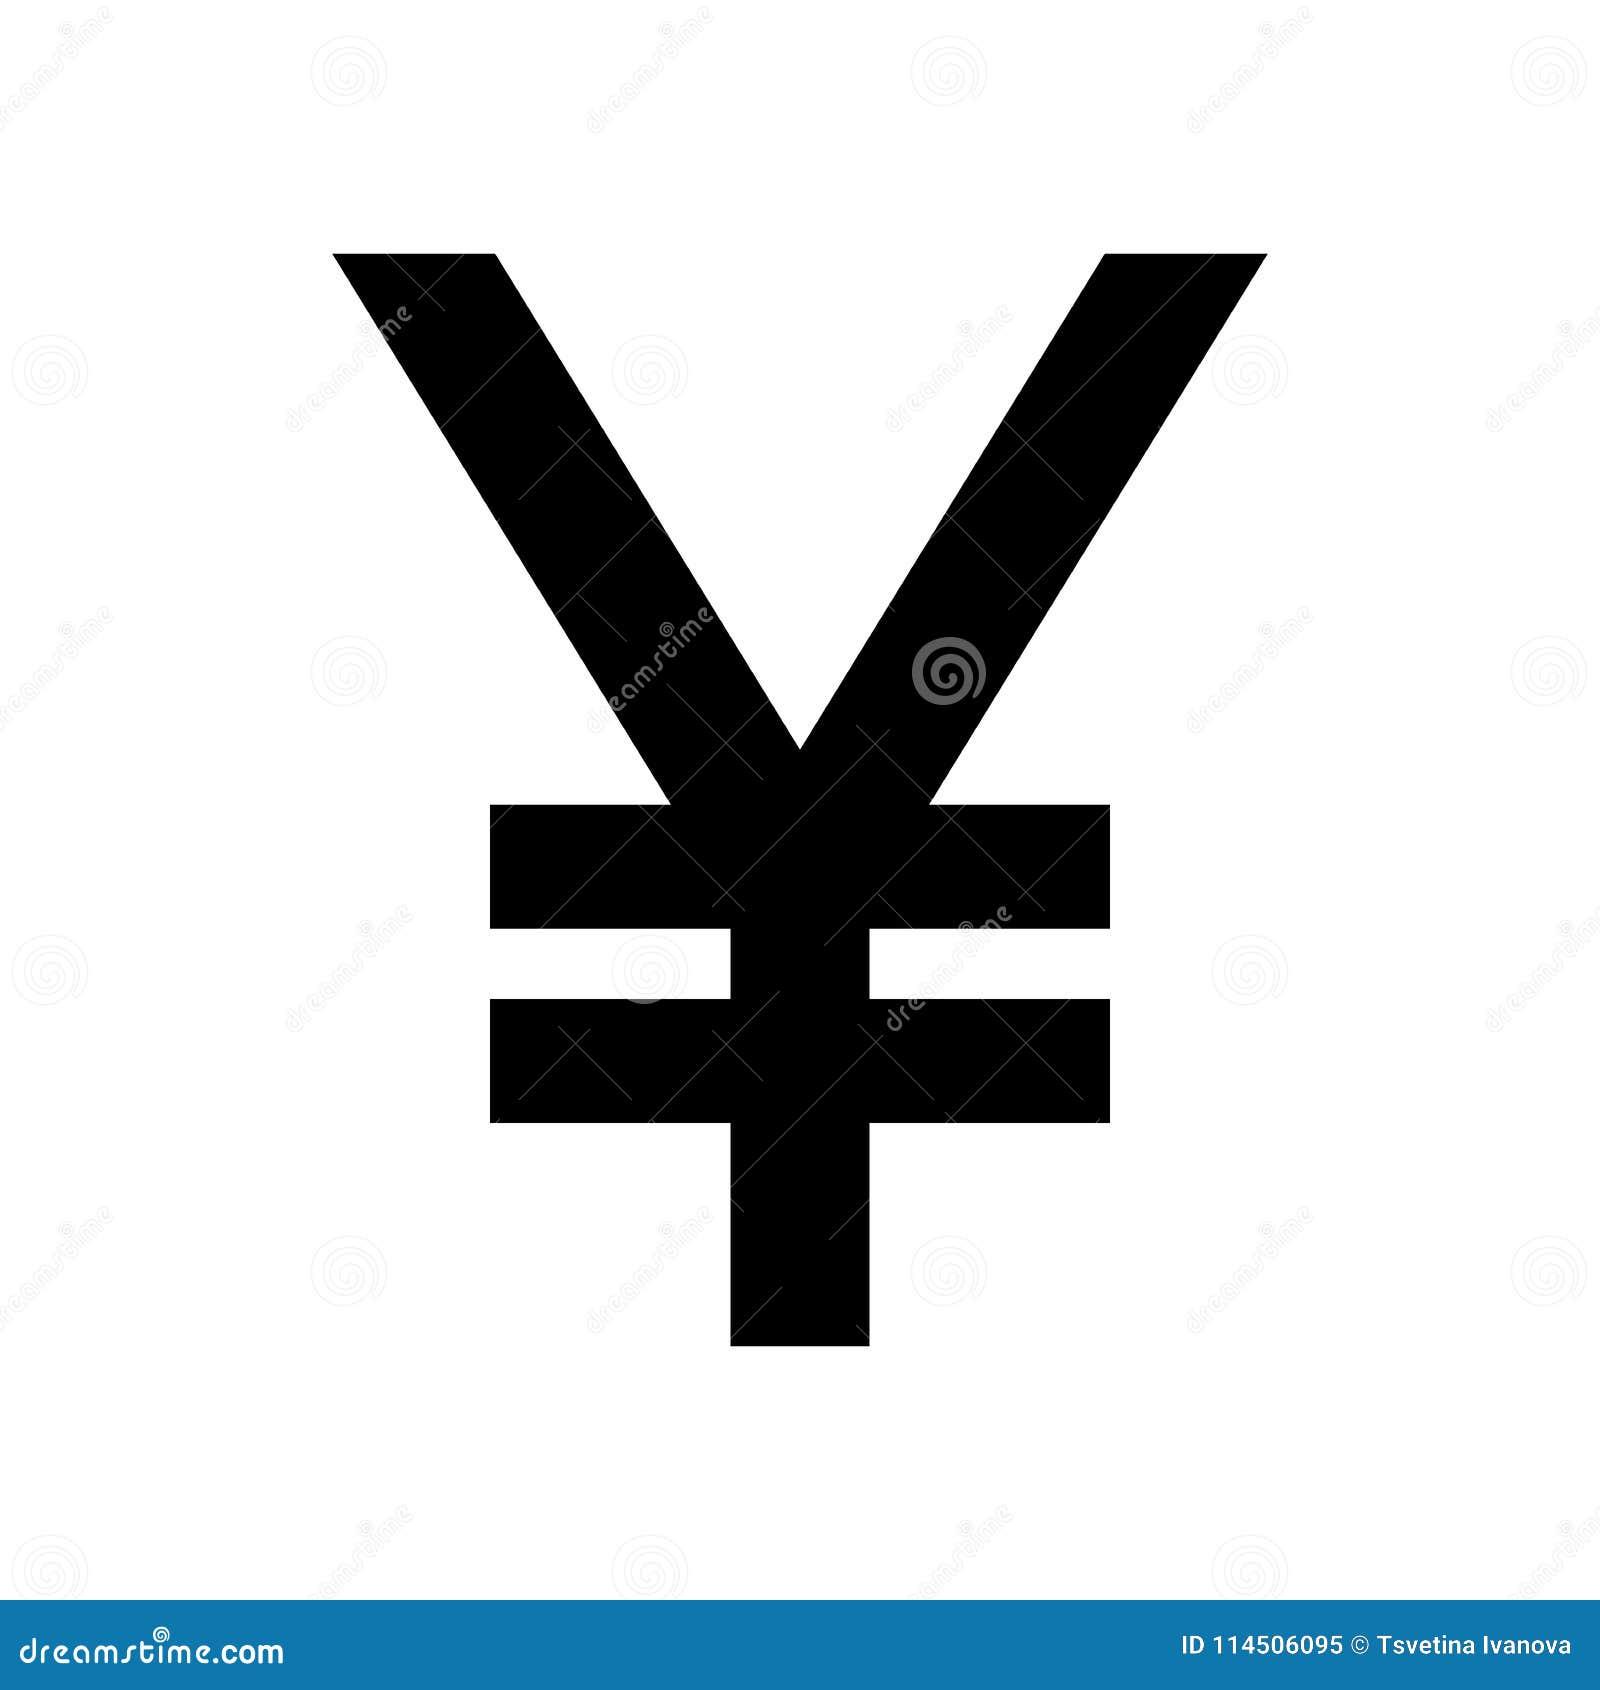 Japanese Yen Currency Symbol Black Japan Yen Sign Stock Vector